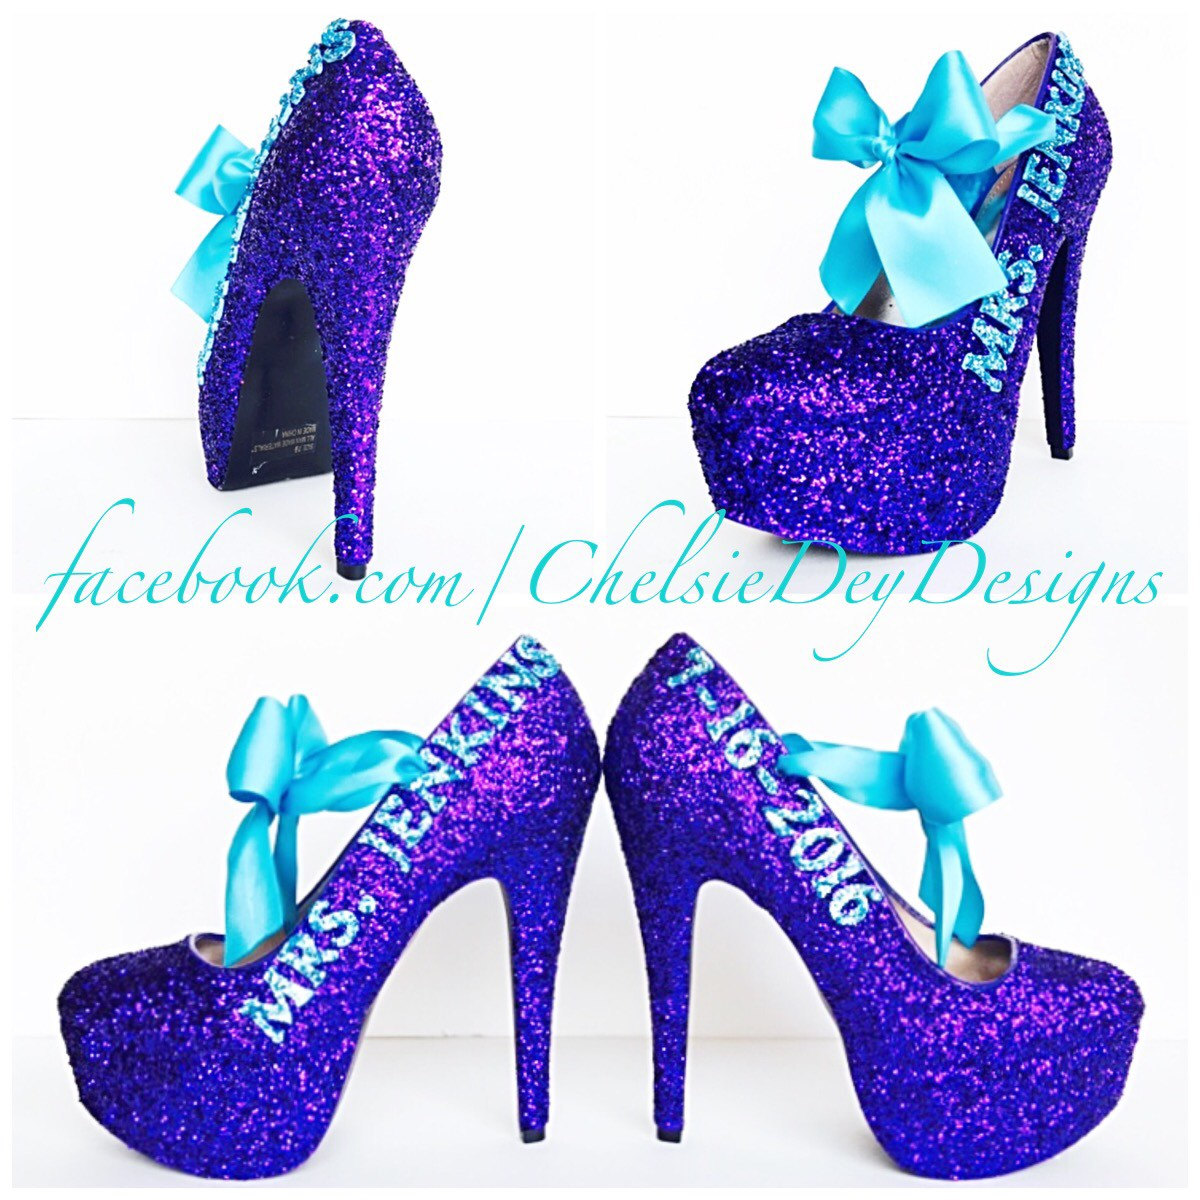 Glitter High Heels - Wedding Pumps - Last Name and Date - Purple ...